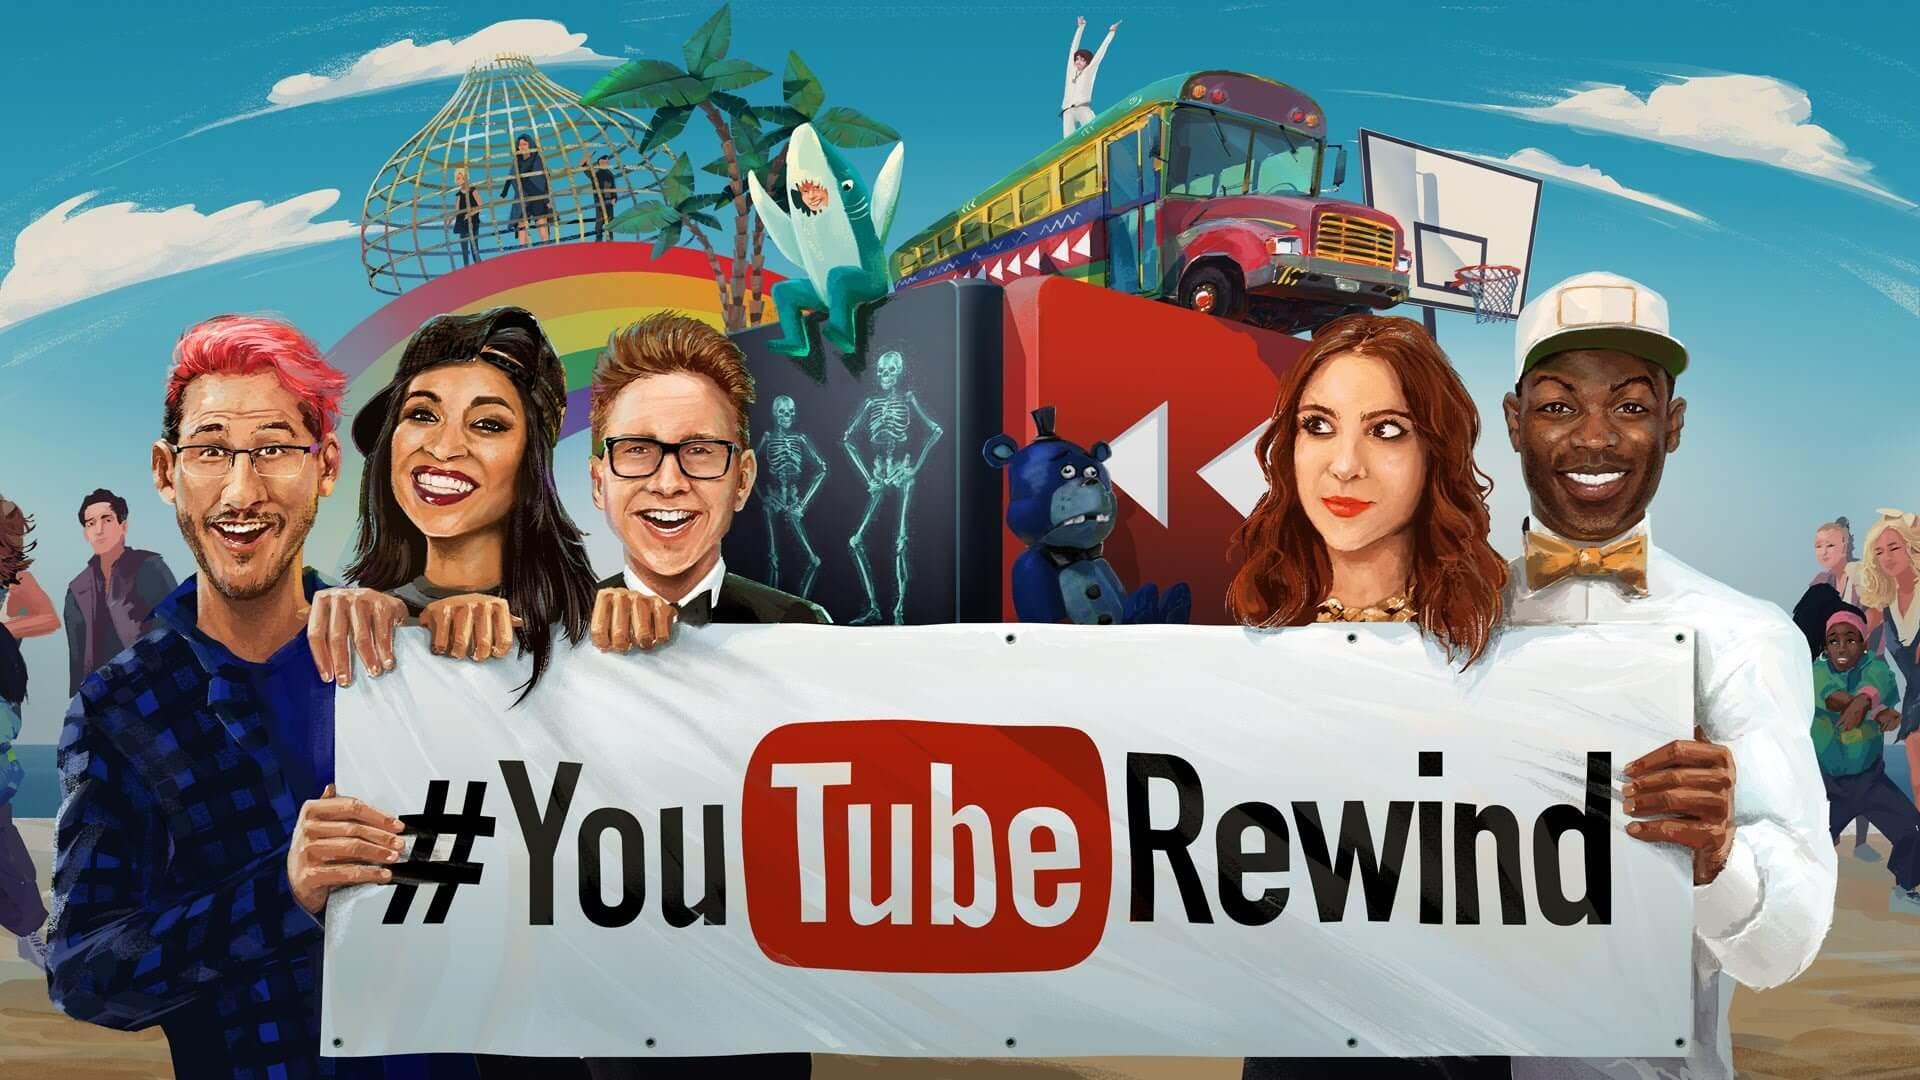 rewind youtube - YouTube Rewind 2017: os 10 vídeos mais assistidos no ano